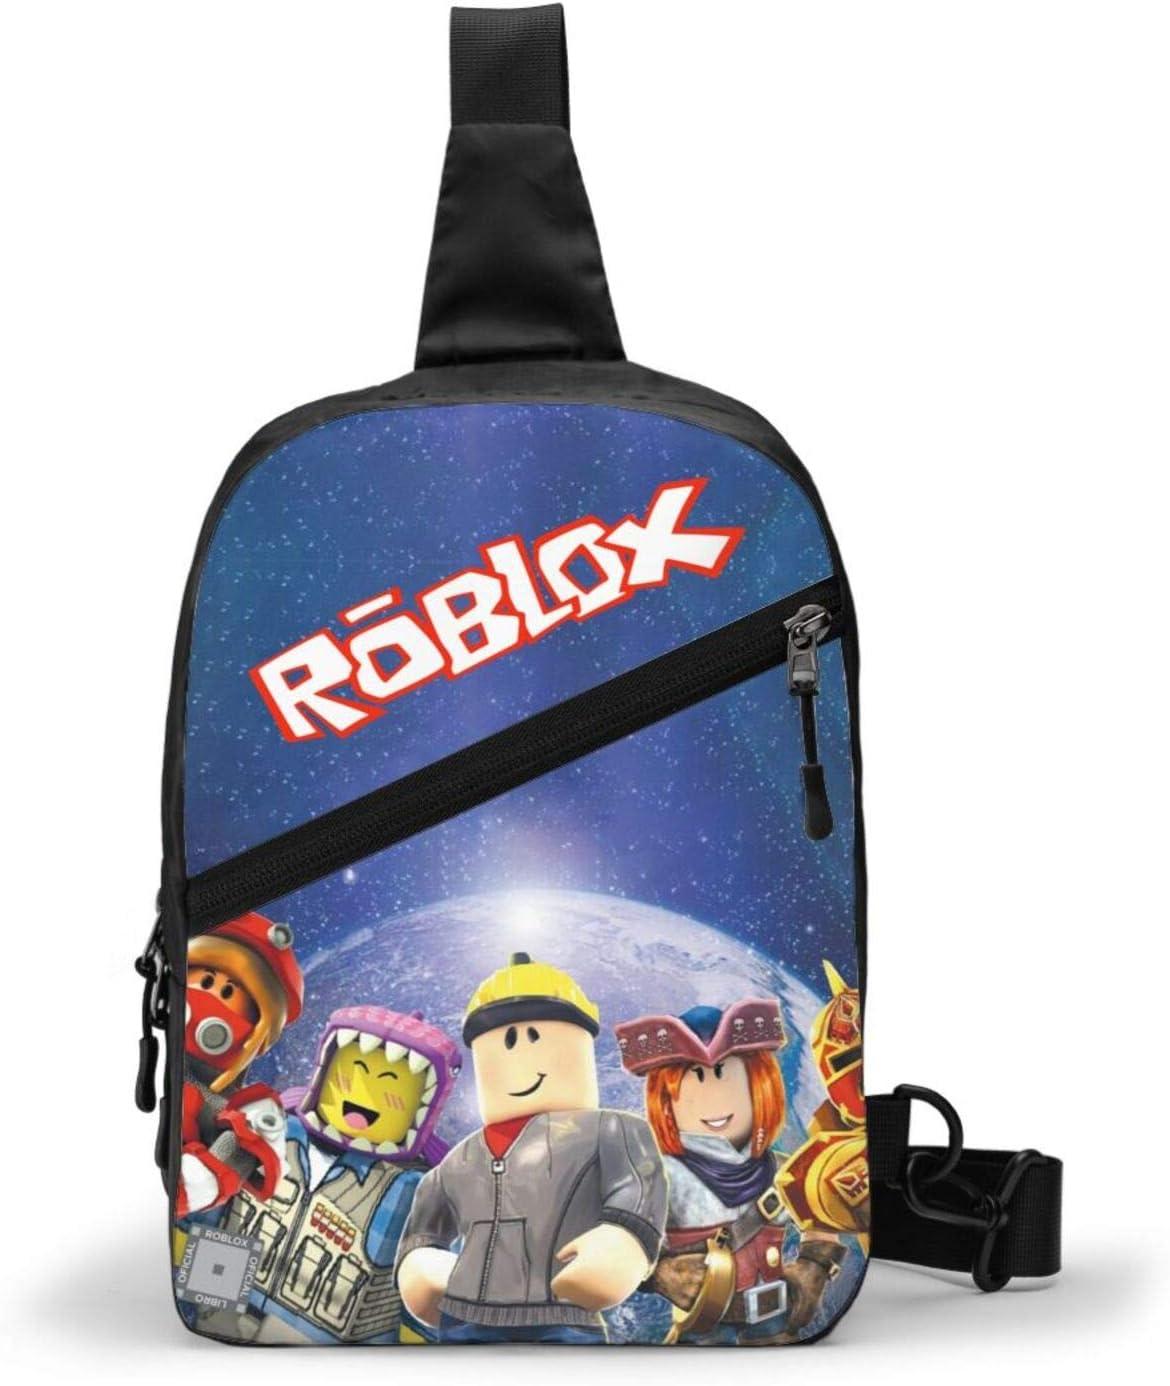 HUAJIELONG Sling Bag Crossbody Chest Shoulder Anti Theft Travel Backpack for Men Women Boys Waterproof - roblox